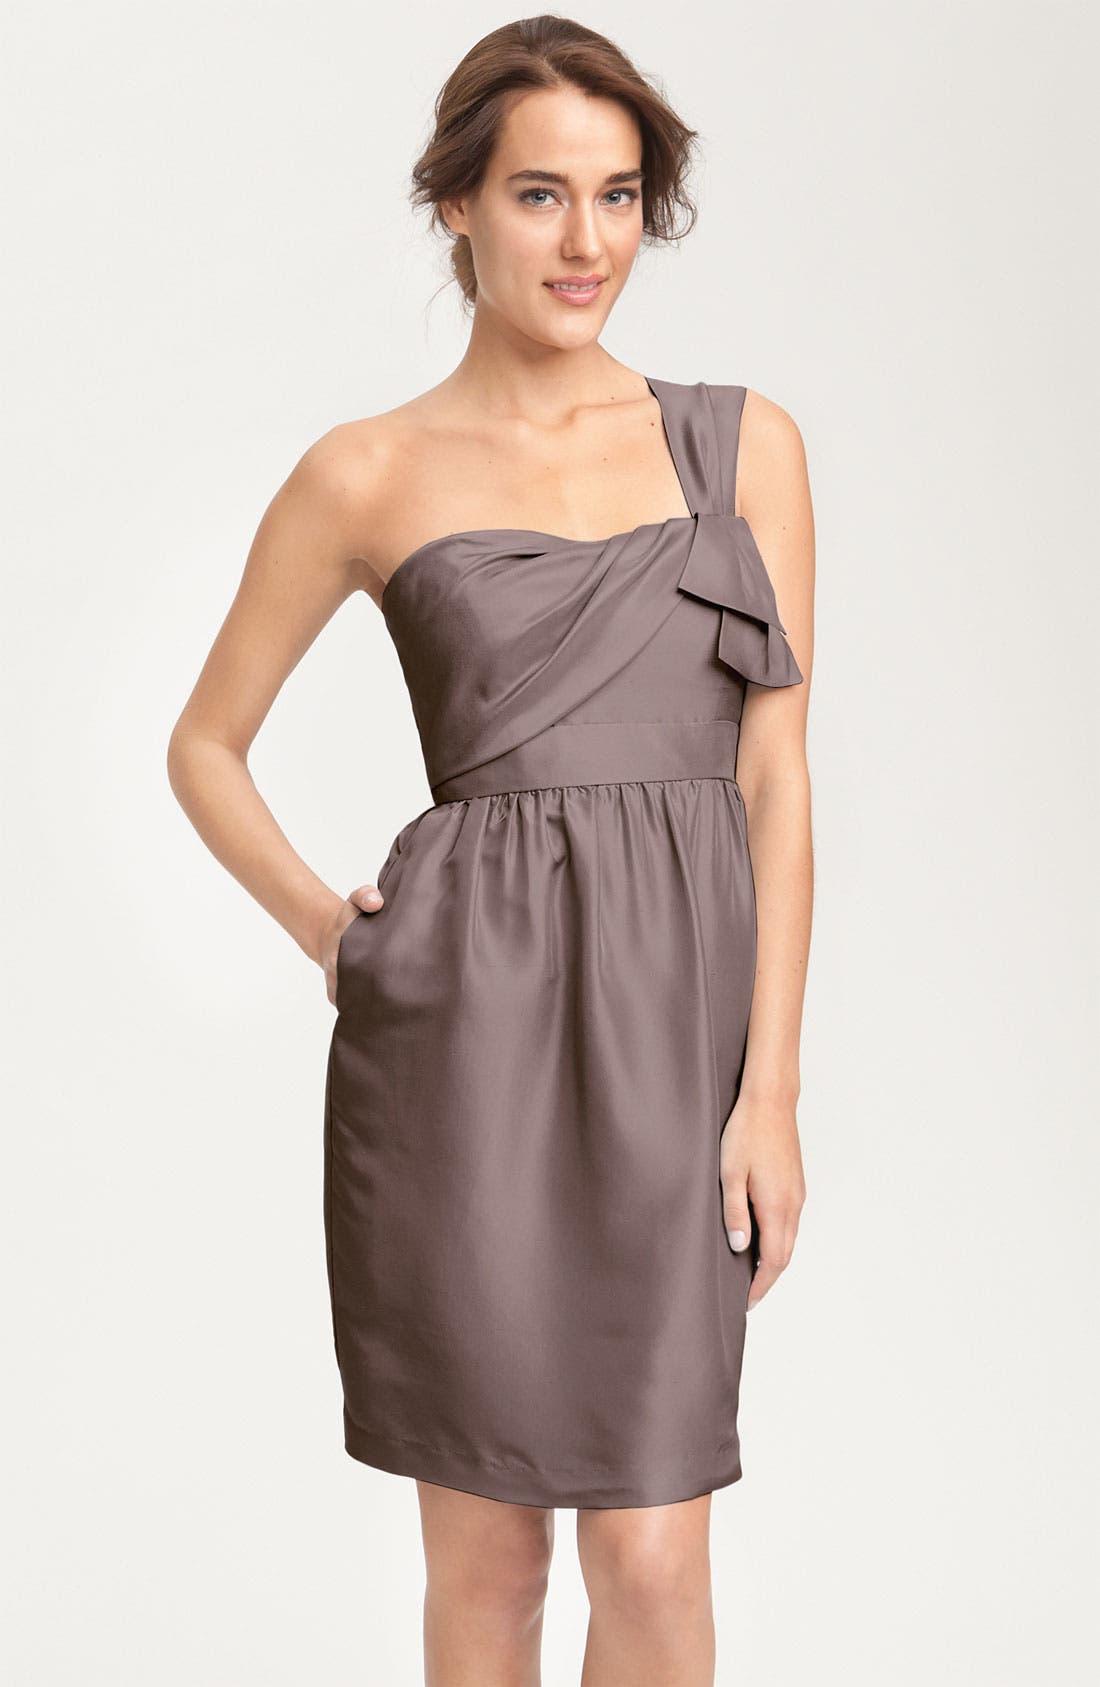 JENNY YOO Convertible Shantung Dress, Main, color, 020